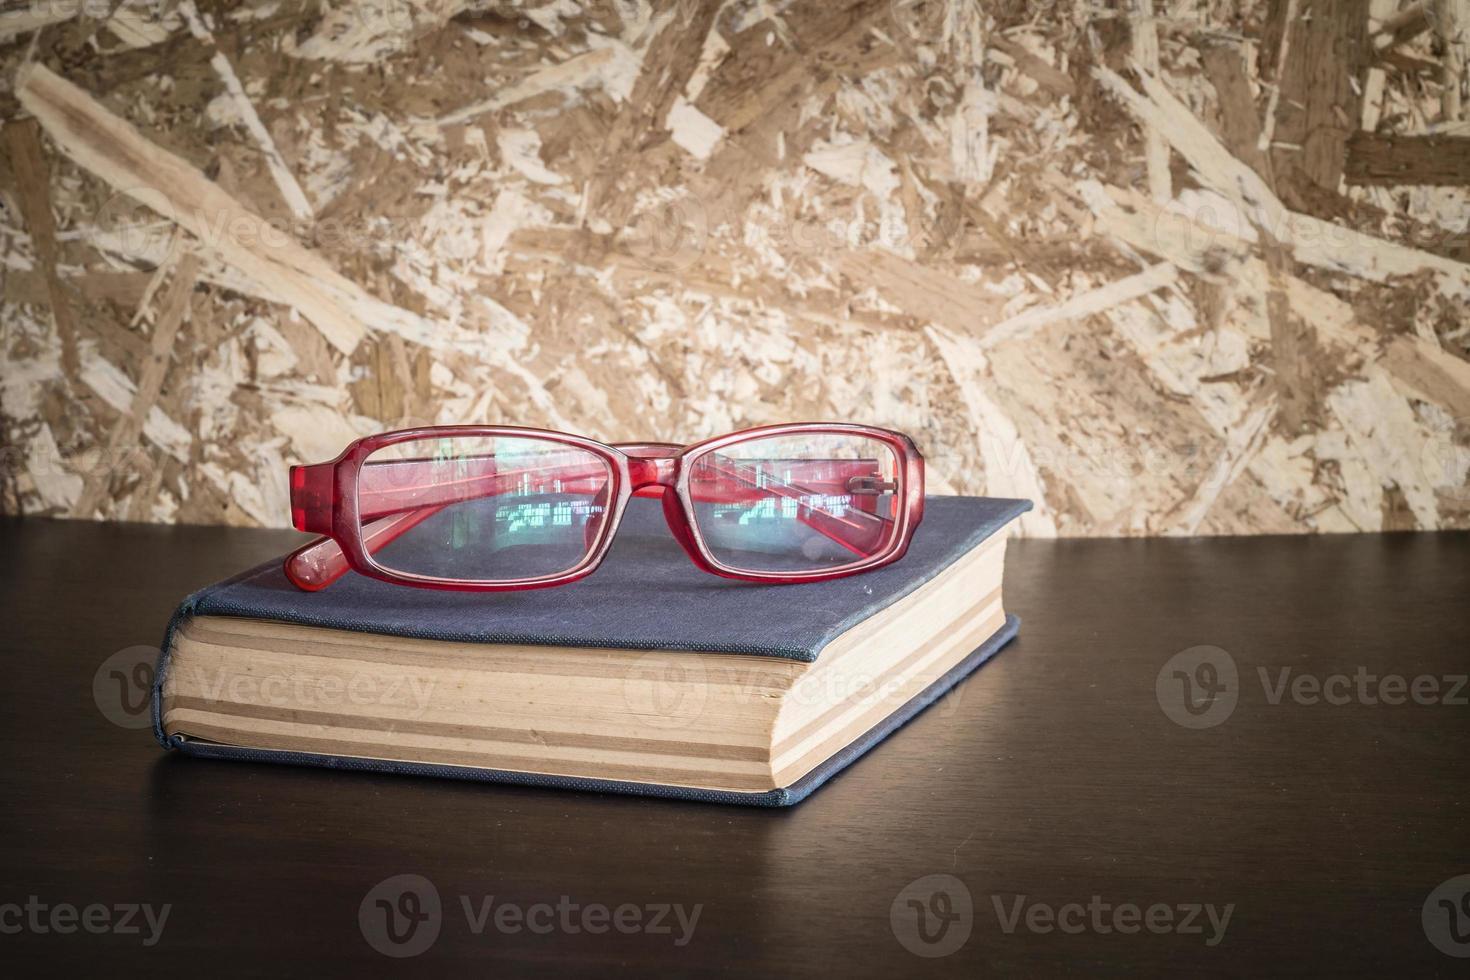 bril en boek met filtereffect retro vintage stijl foto